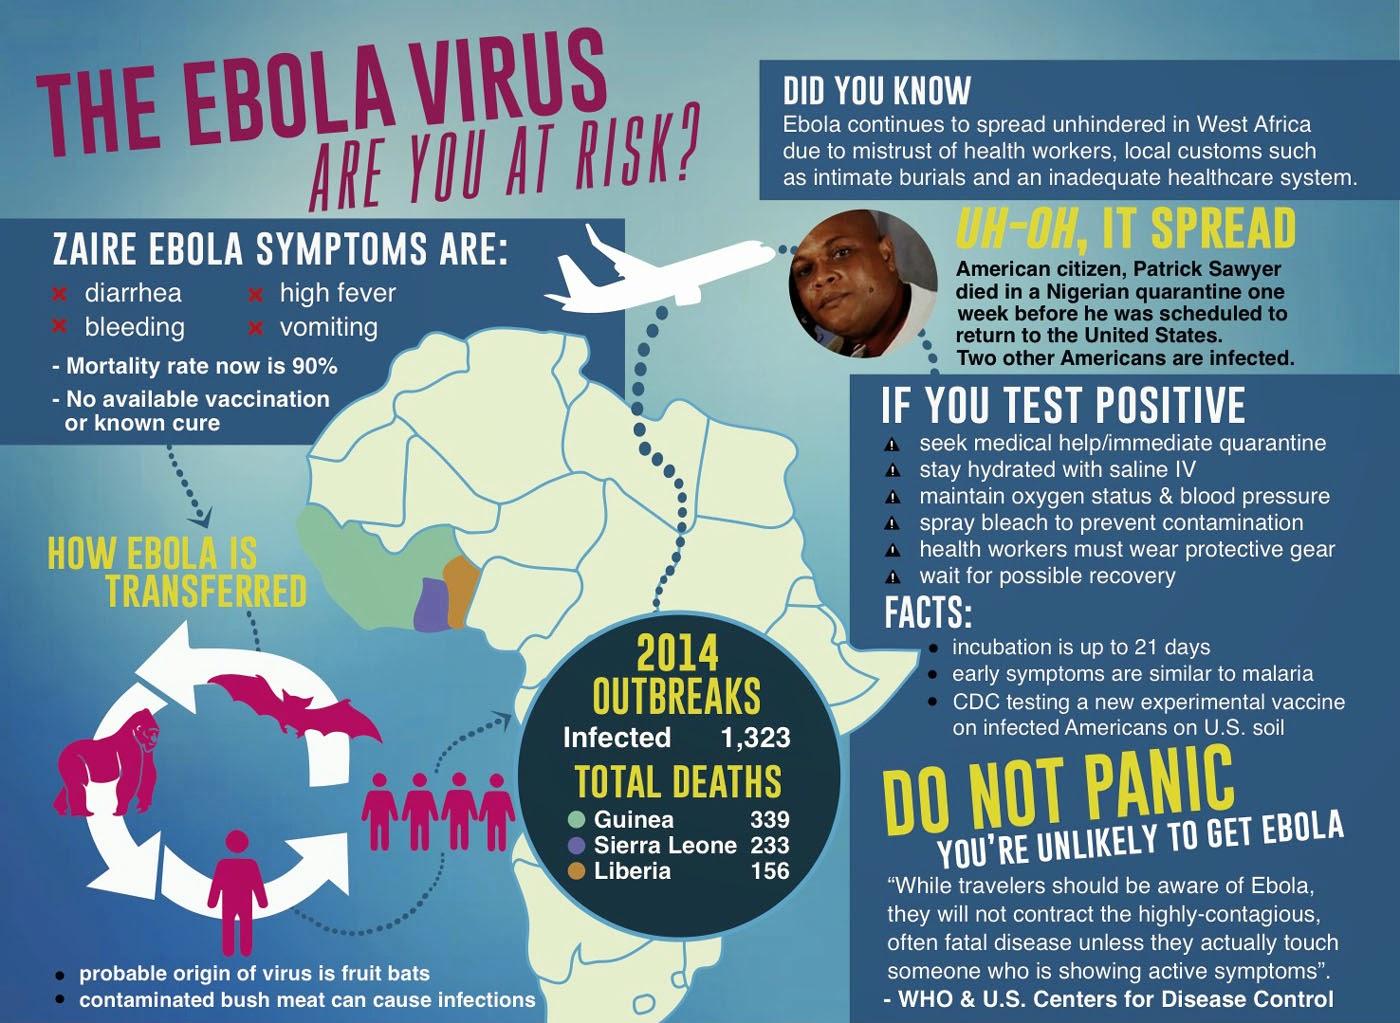 Outbreak of Ebola Virus 2014